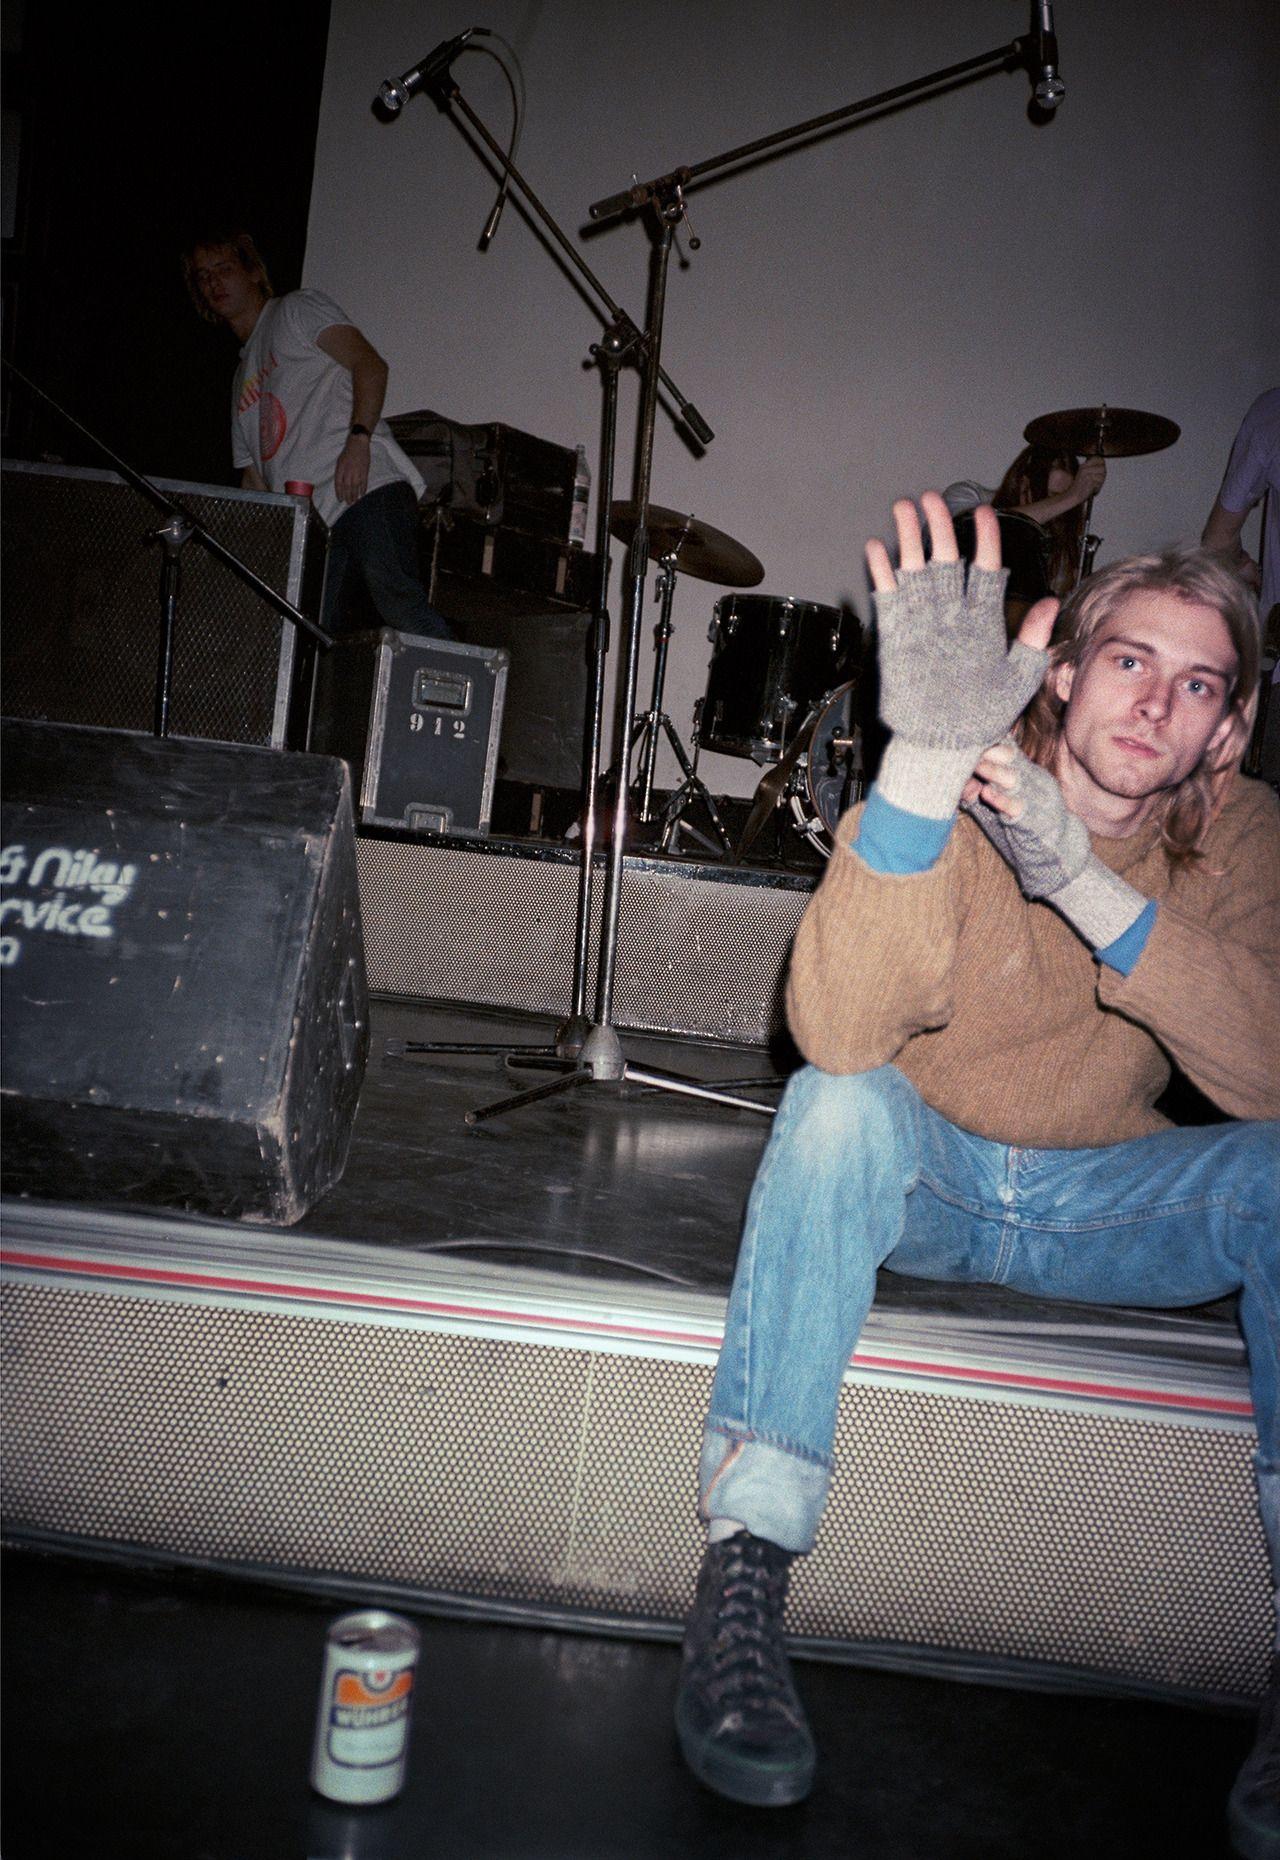 Kurt Cobain greeting photographer Bruce Pavitt when he arrived at the Piper Club, Rome, 27 November 1989.